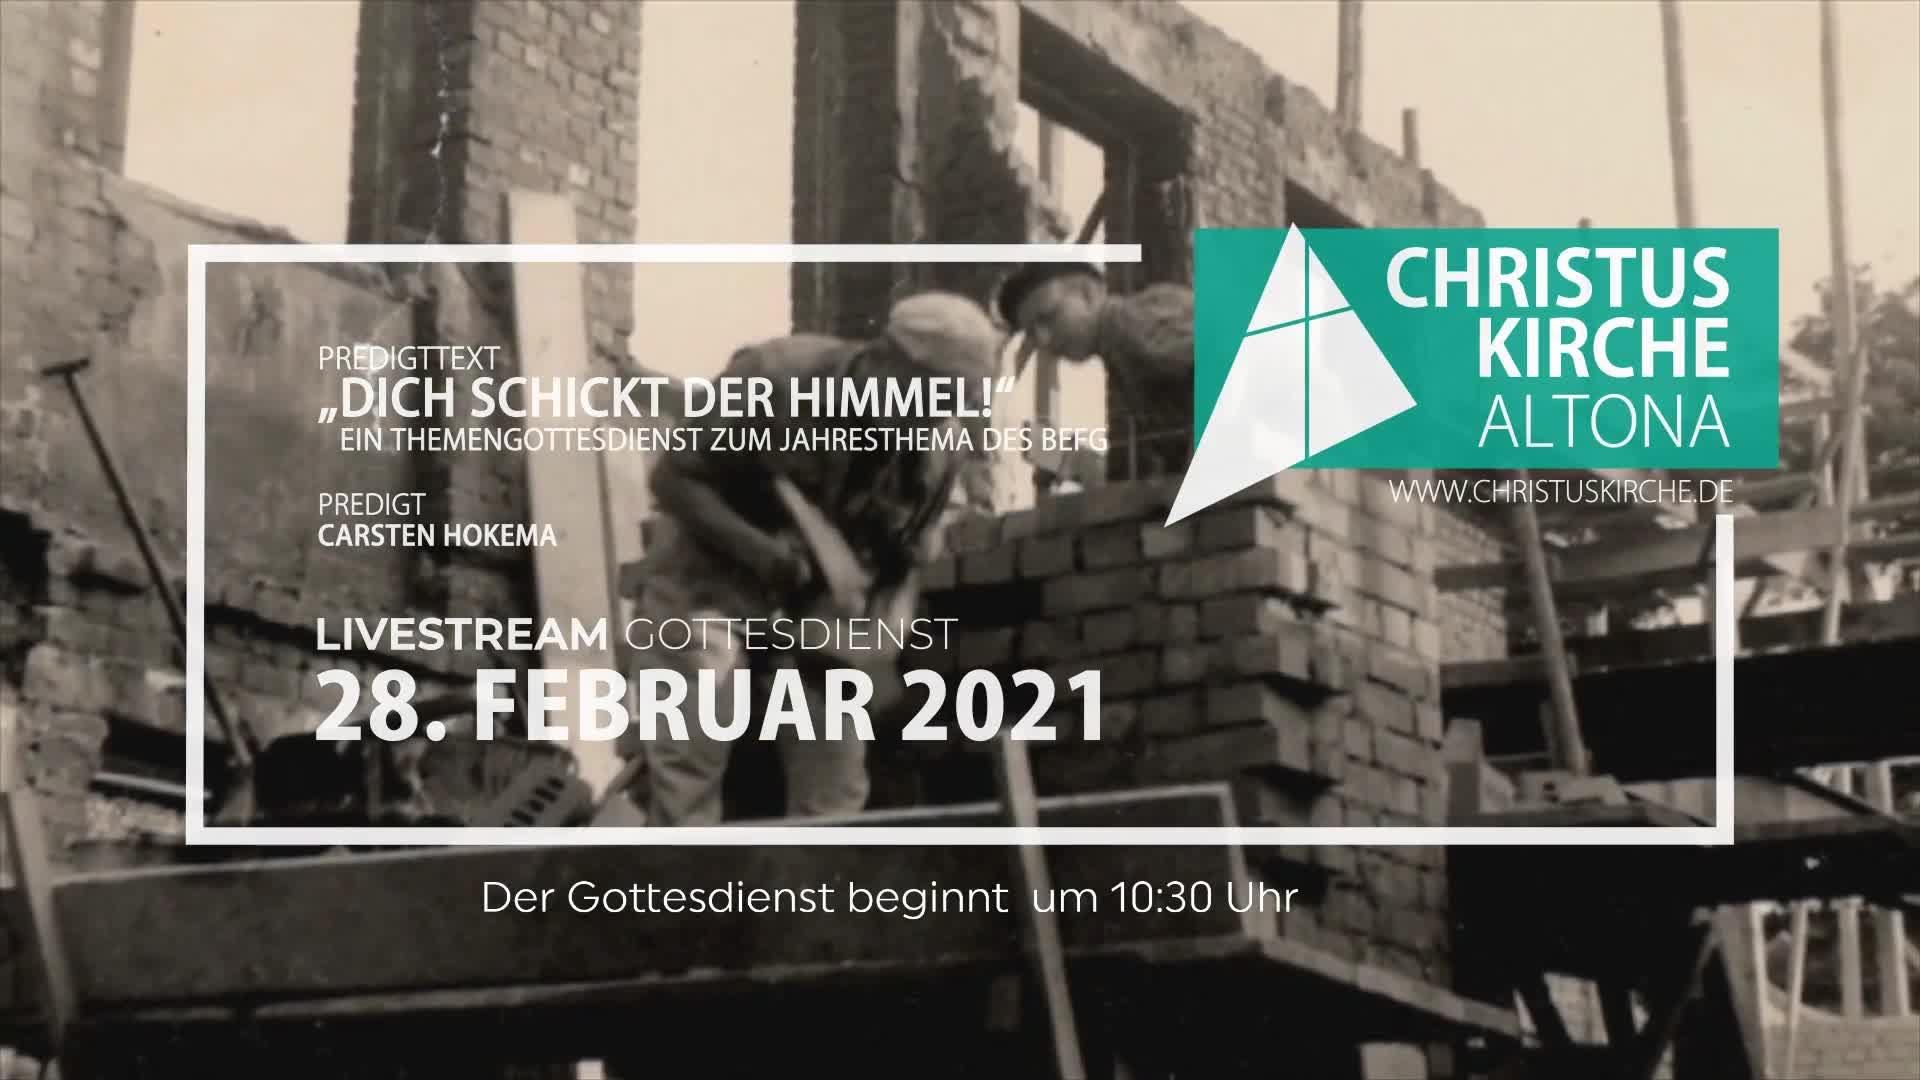 Gottesdienst am 28. Februar - Livestream aus der Christuskirche Altona on 28-Feb-21-09:13:21